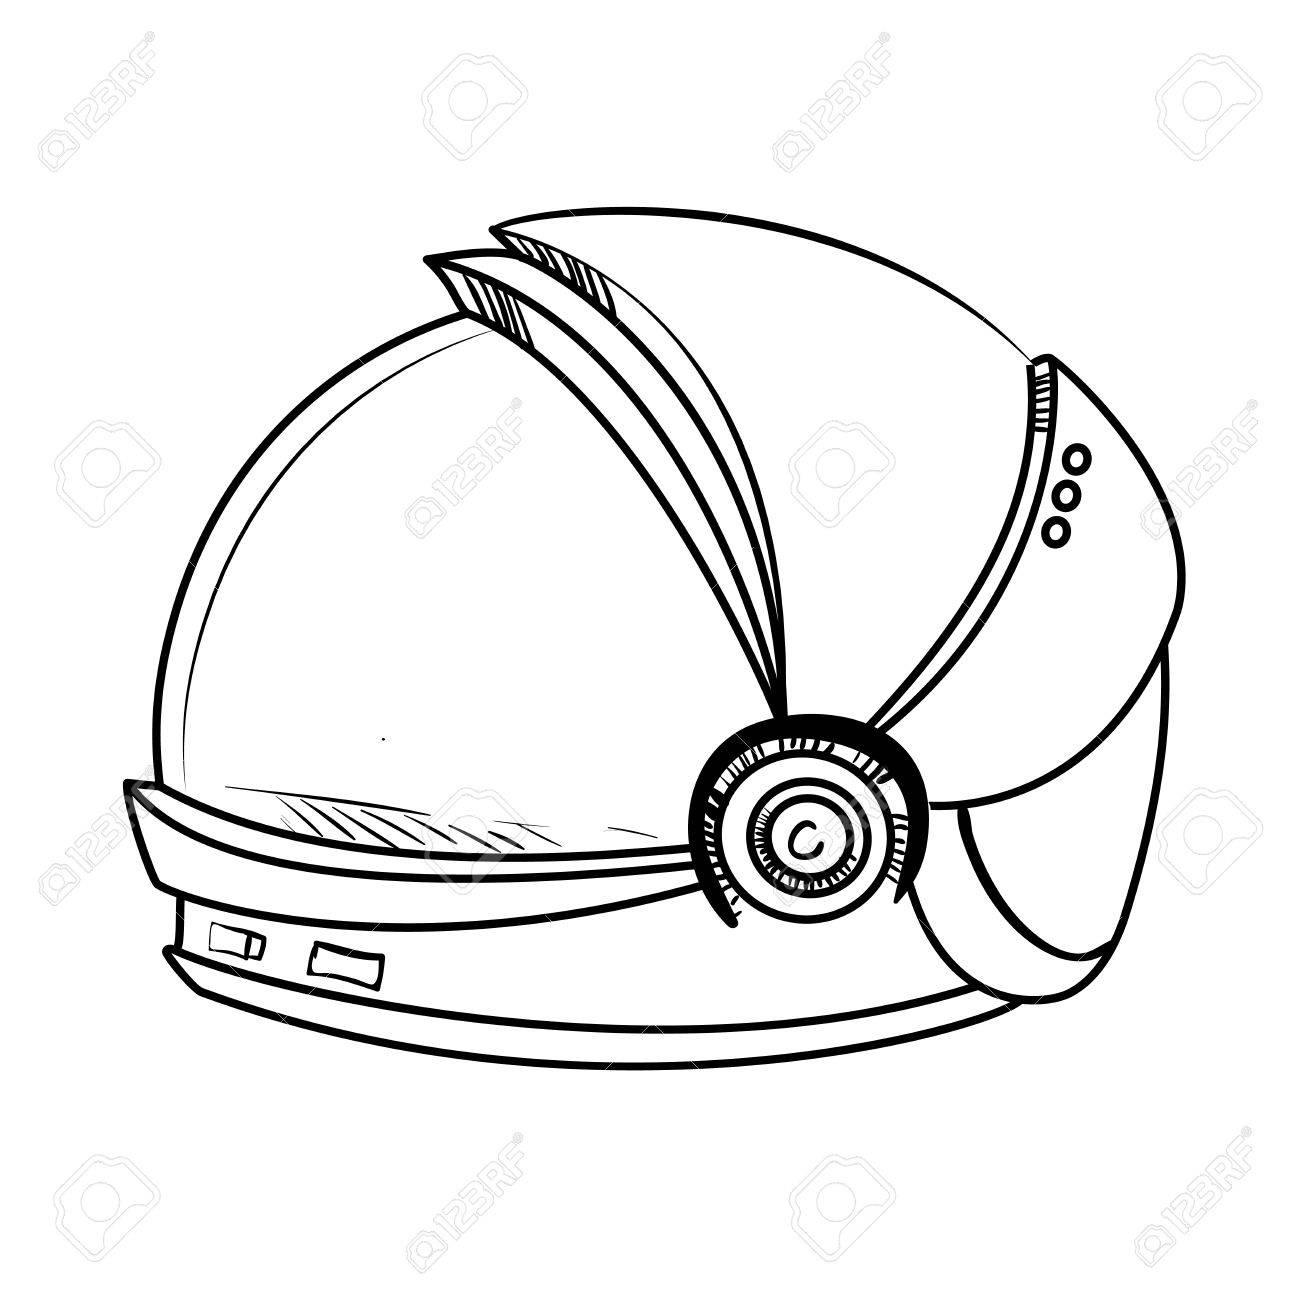 1300x1300 Astronaut Sketch Spacesuit Royalty Free Cliparts, Vectors,